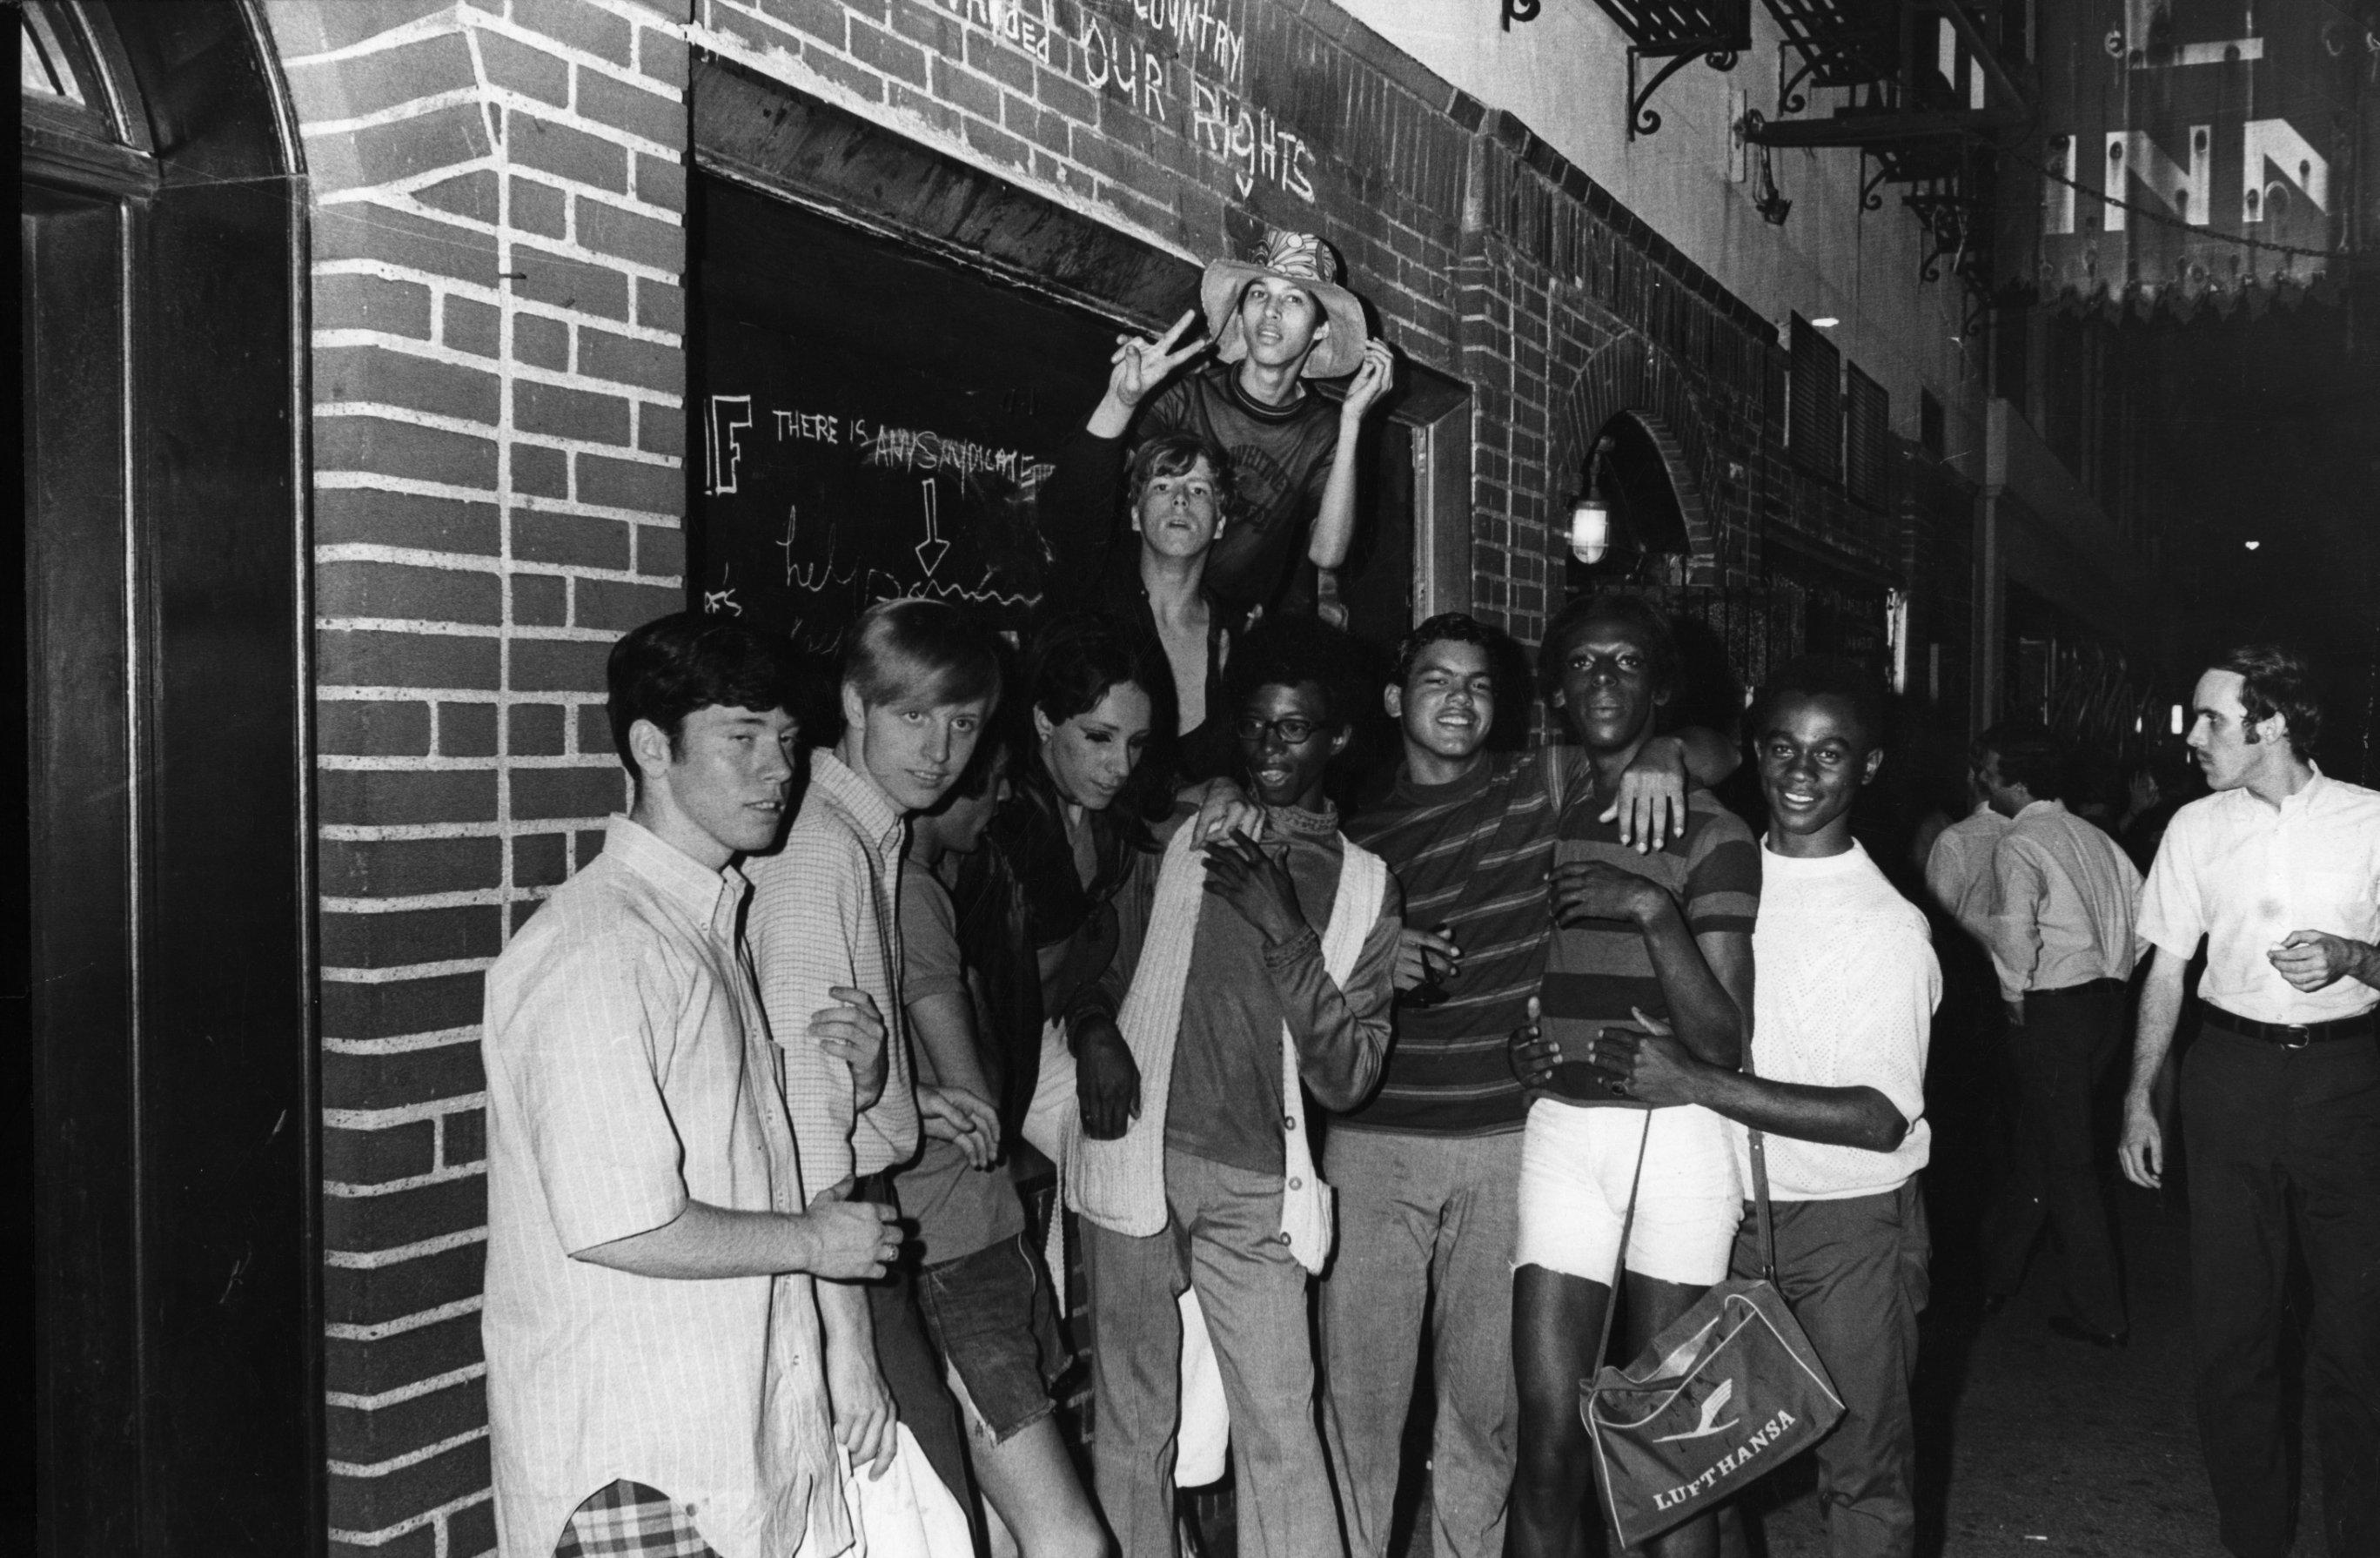 Resultado de imagen para stonewall inn before riots